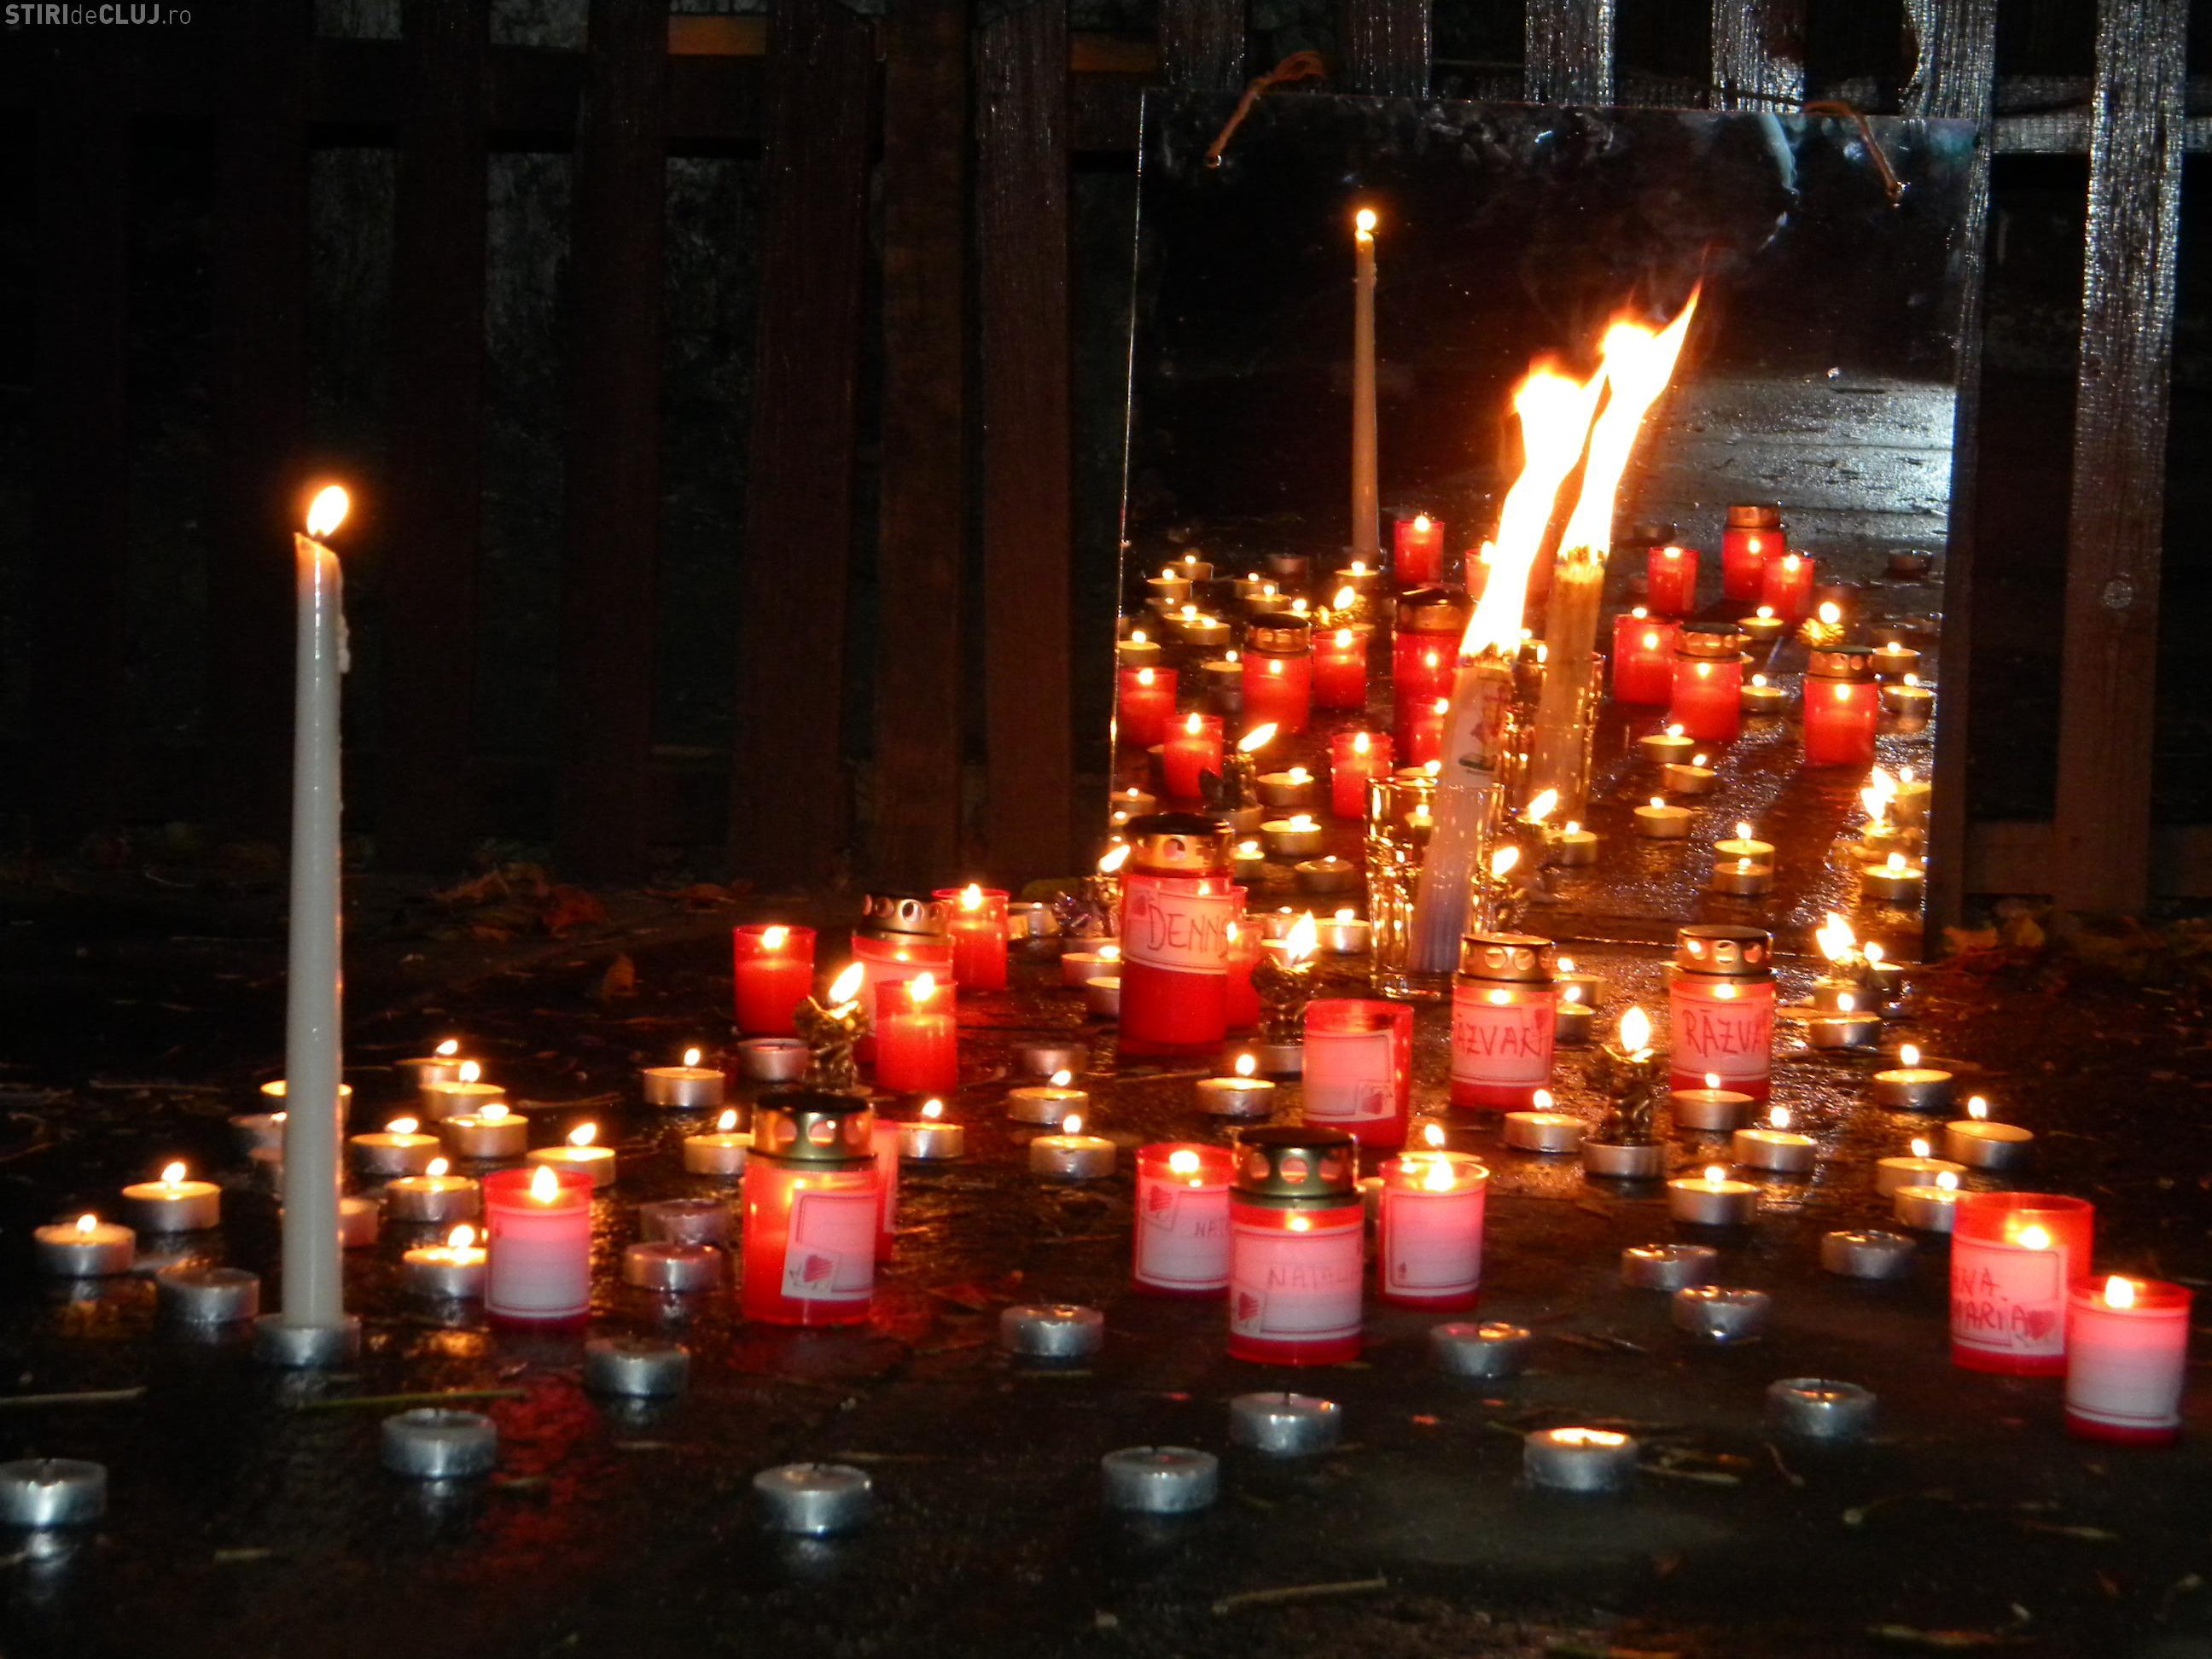 Parintii care si-au pierdut copiii au aprins lumanari in curtea Muzeului Etnografic FOTO